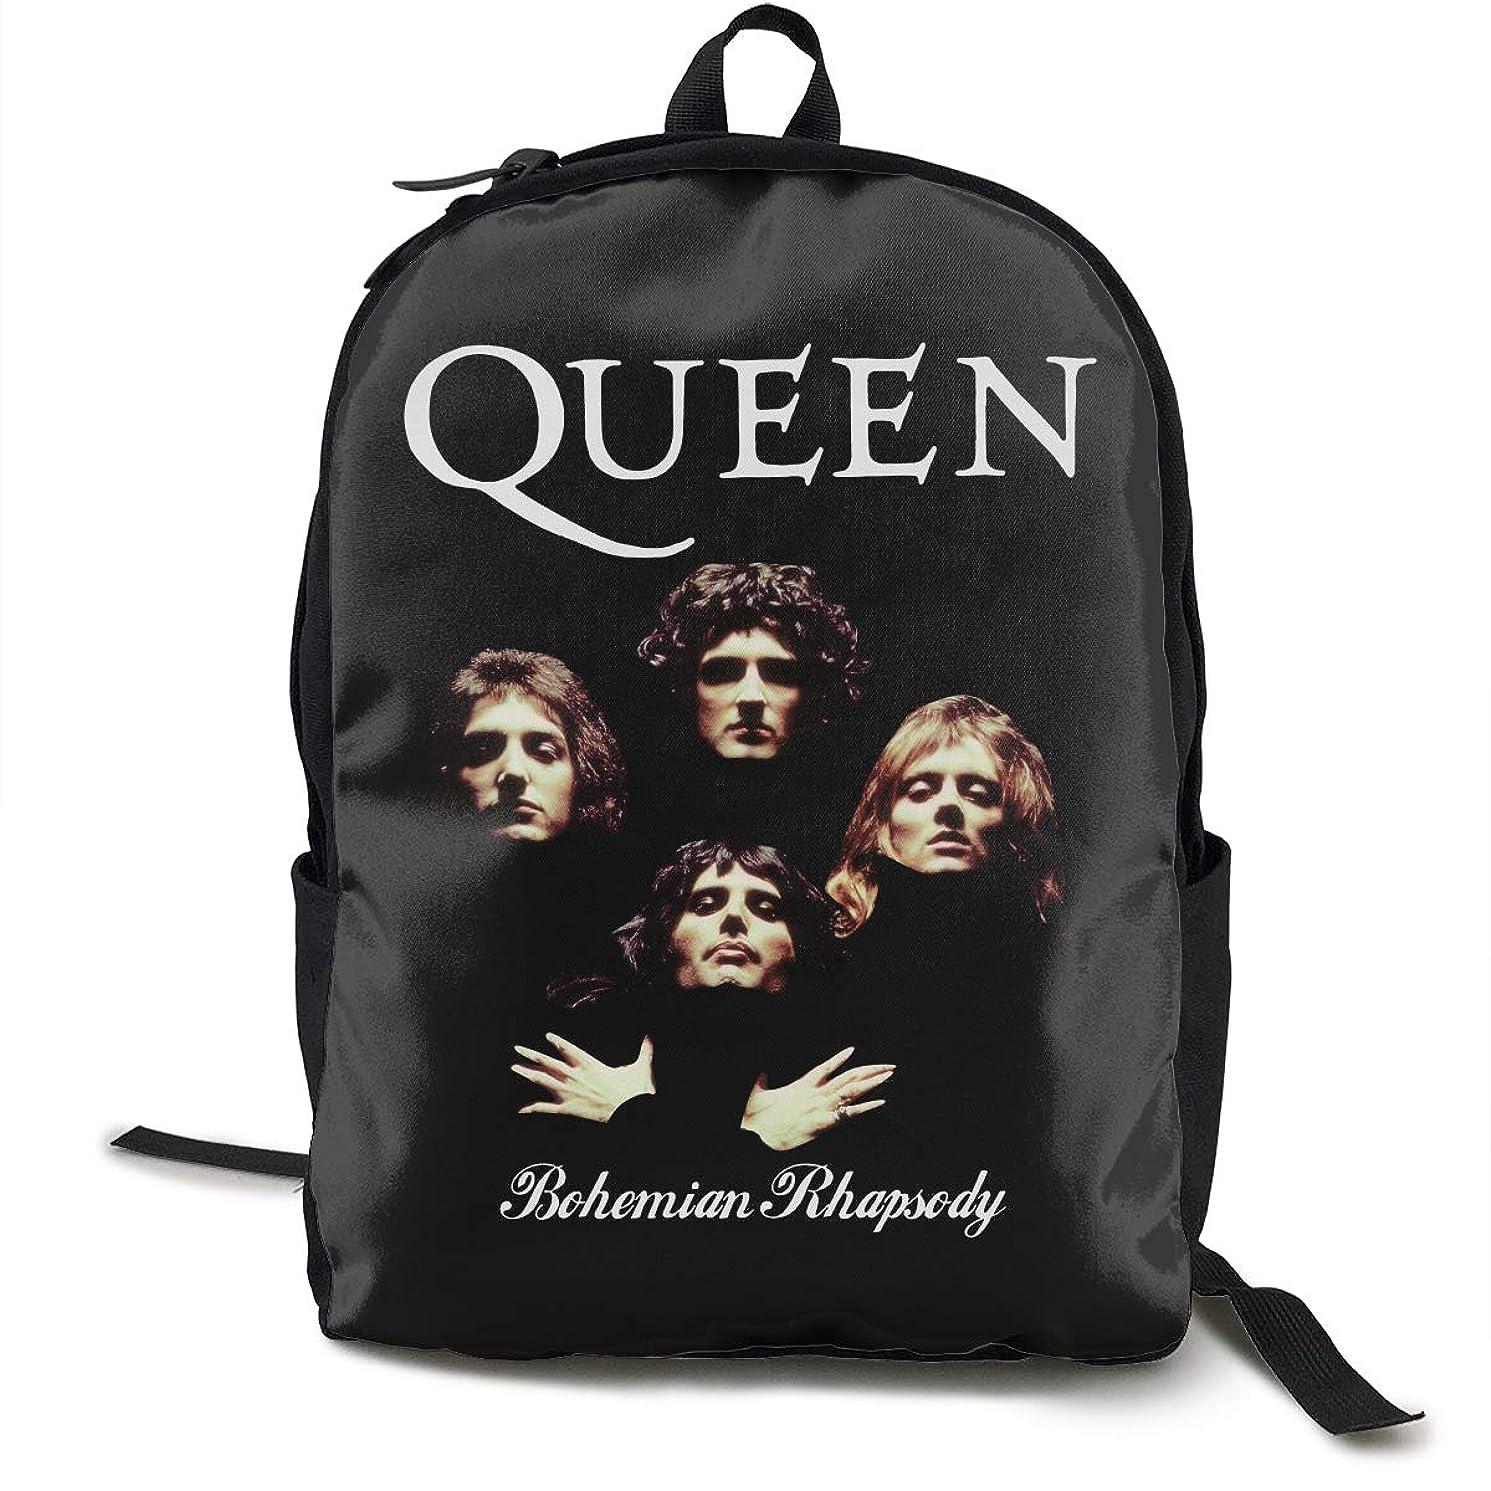 Queen Band Bohemian Rhapsody Backpacks Waterproof Shoulder Bags Laptop School Travel Large Bag For Men Women Black